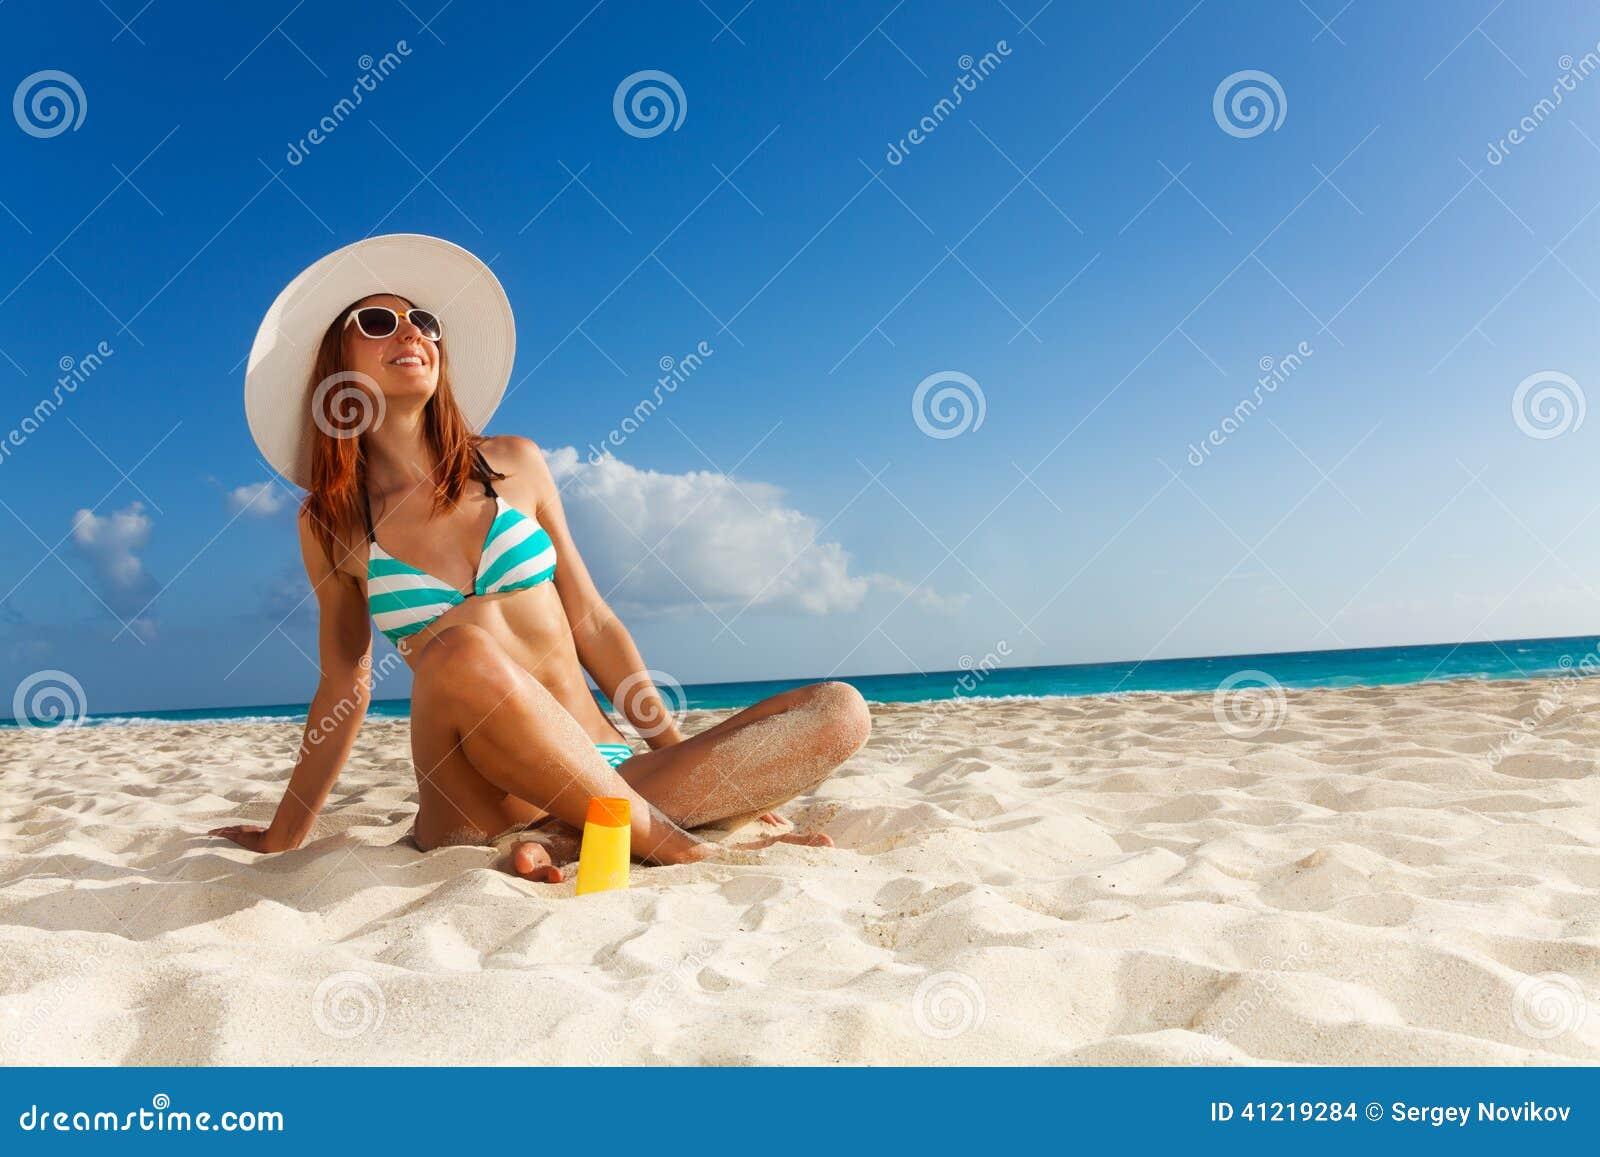 acb62089540 Girl Sunbathing On White Sand Beach Stock Photo - Image of beach ...